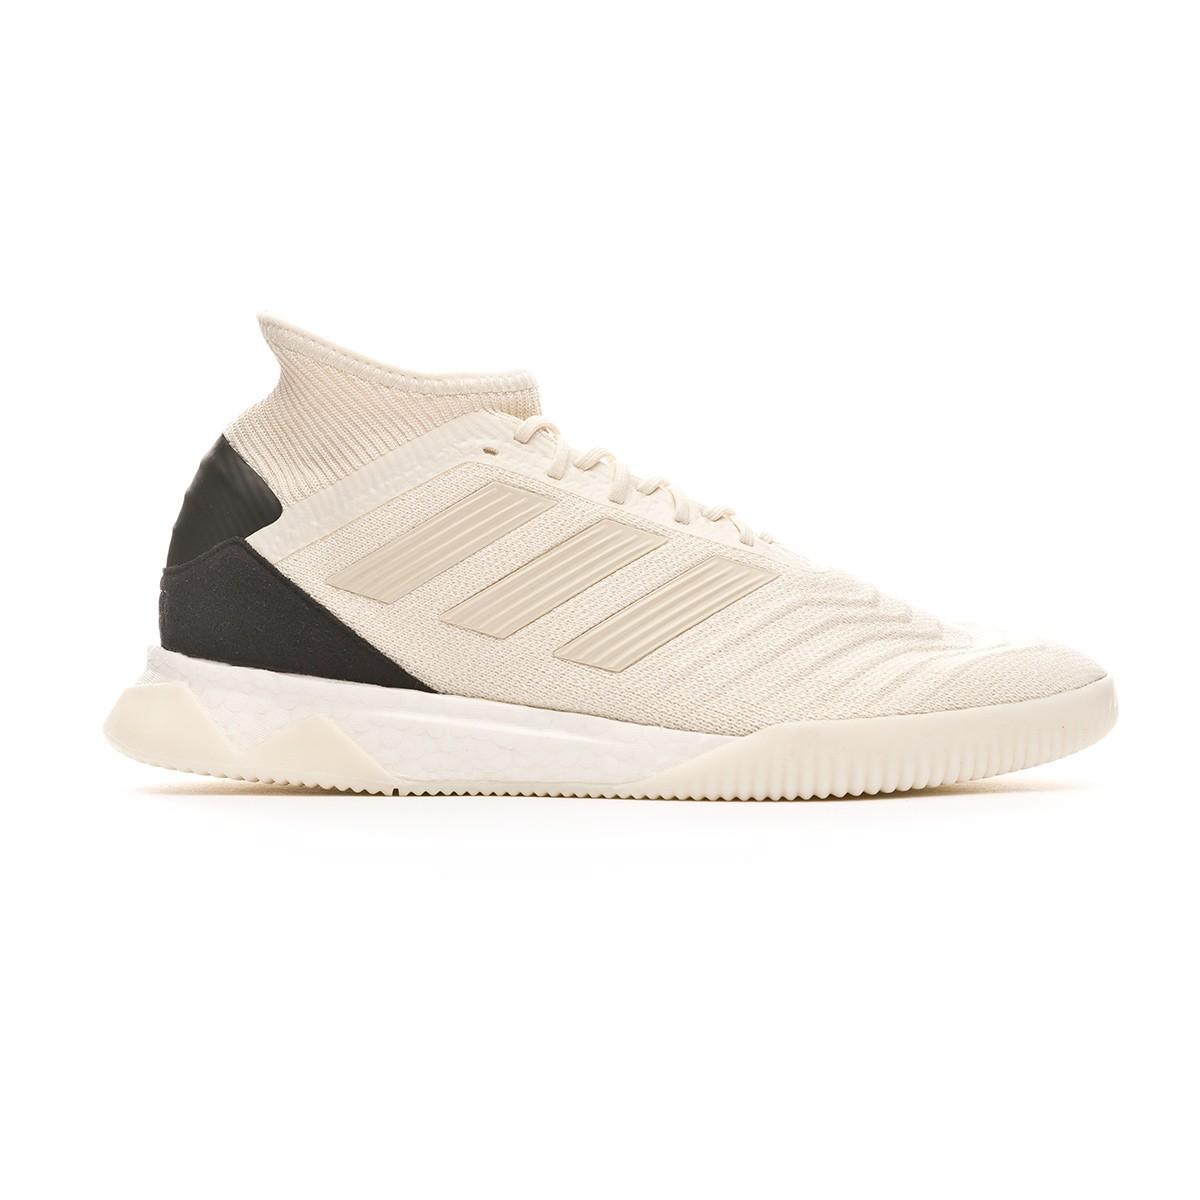 27defed1ee20e Trainers adidas Predator Tango 19.1 TR Off white-Off white-Core black -  Football store Fútbol Emotion